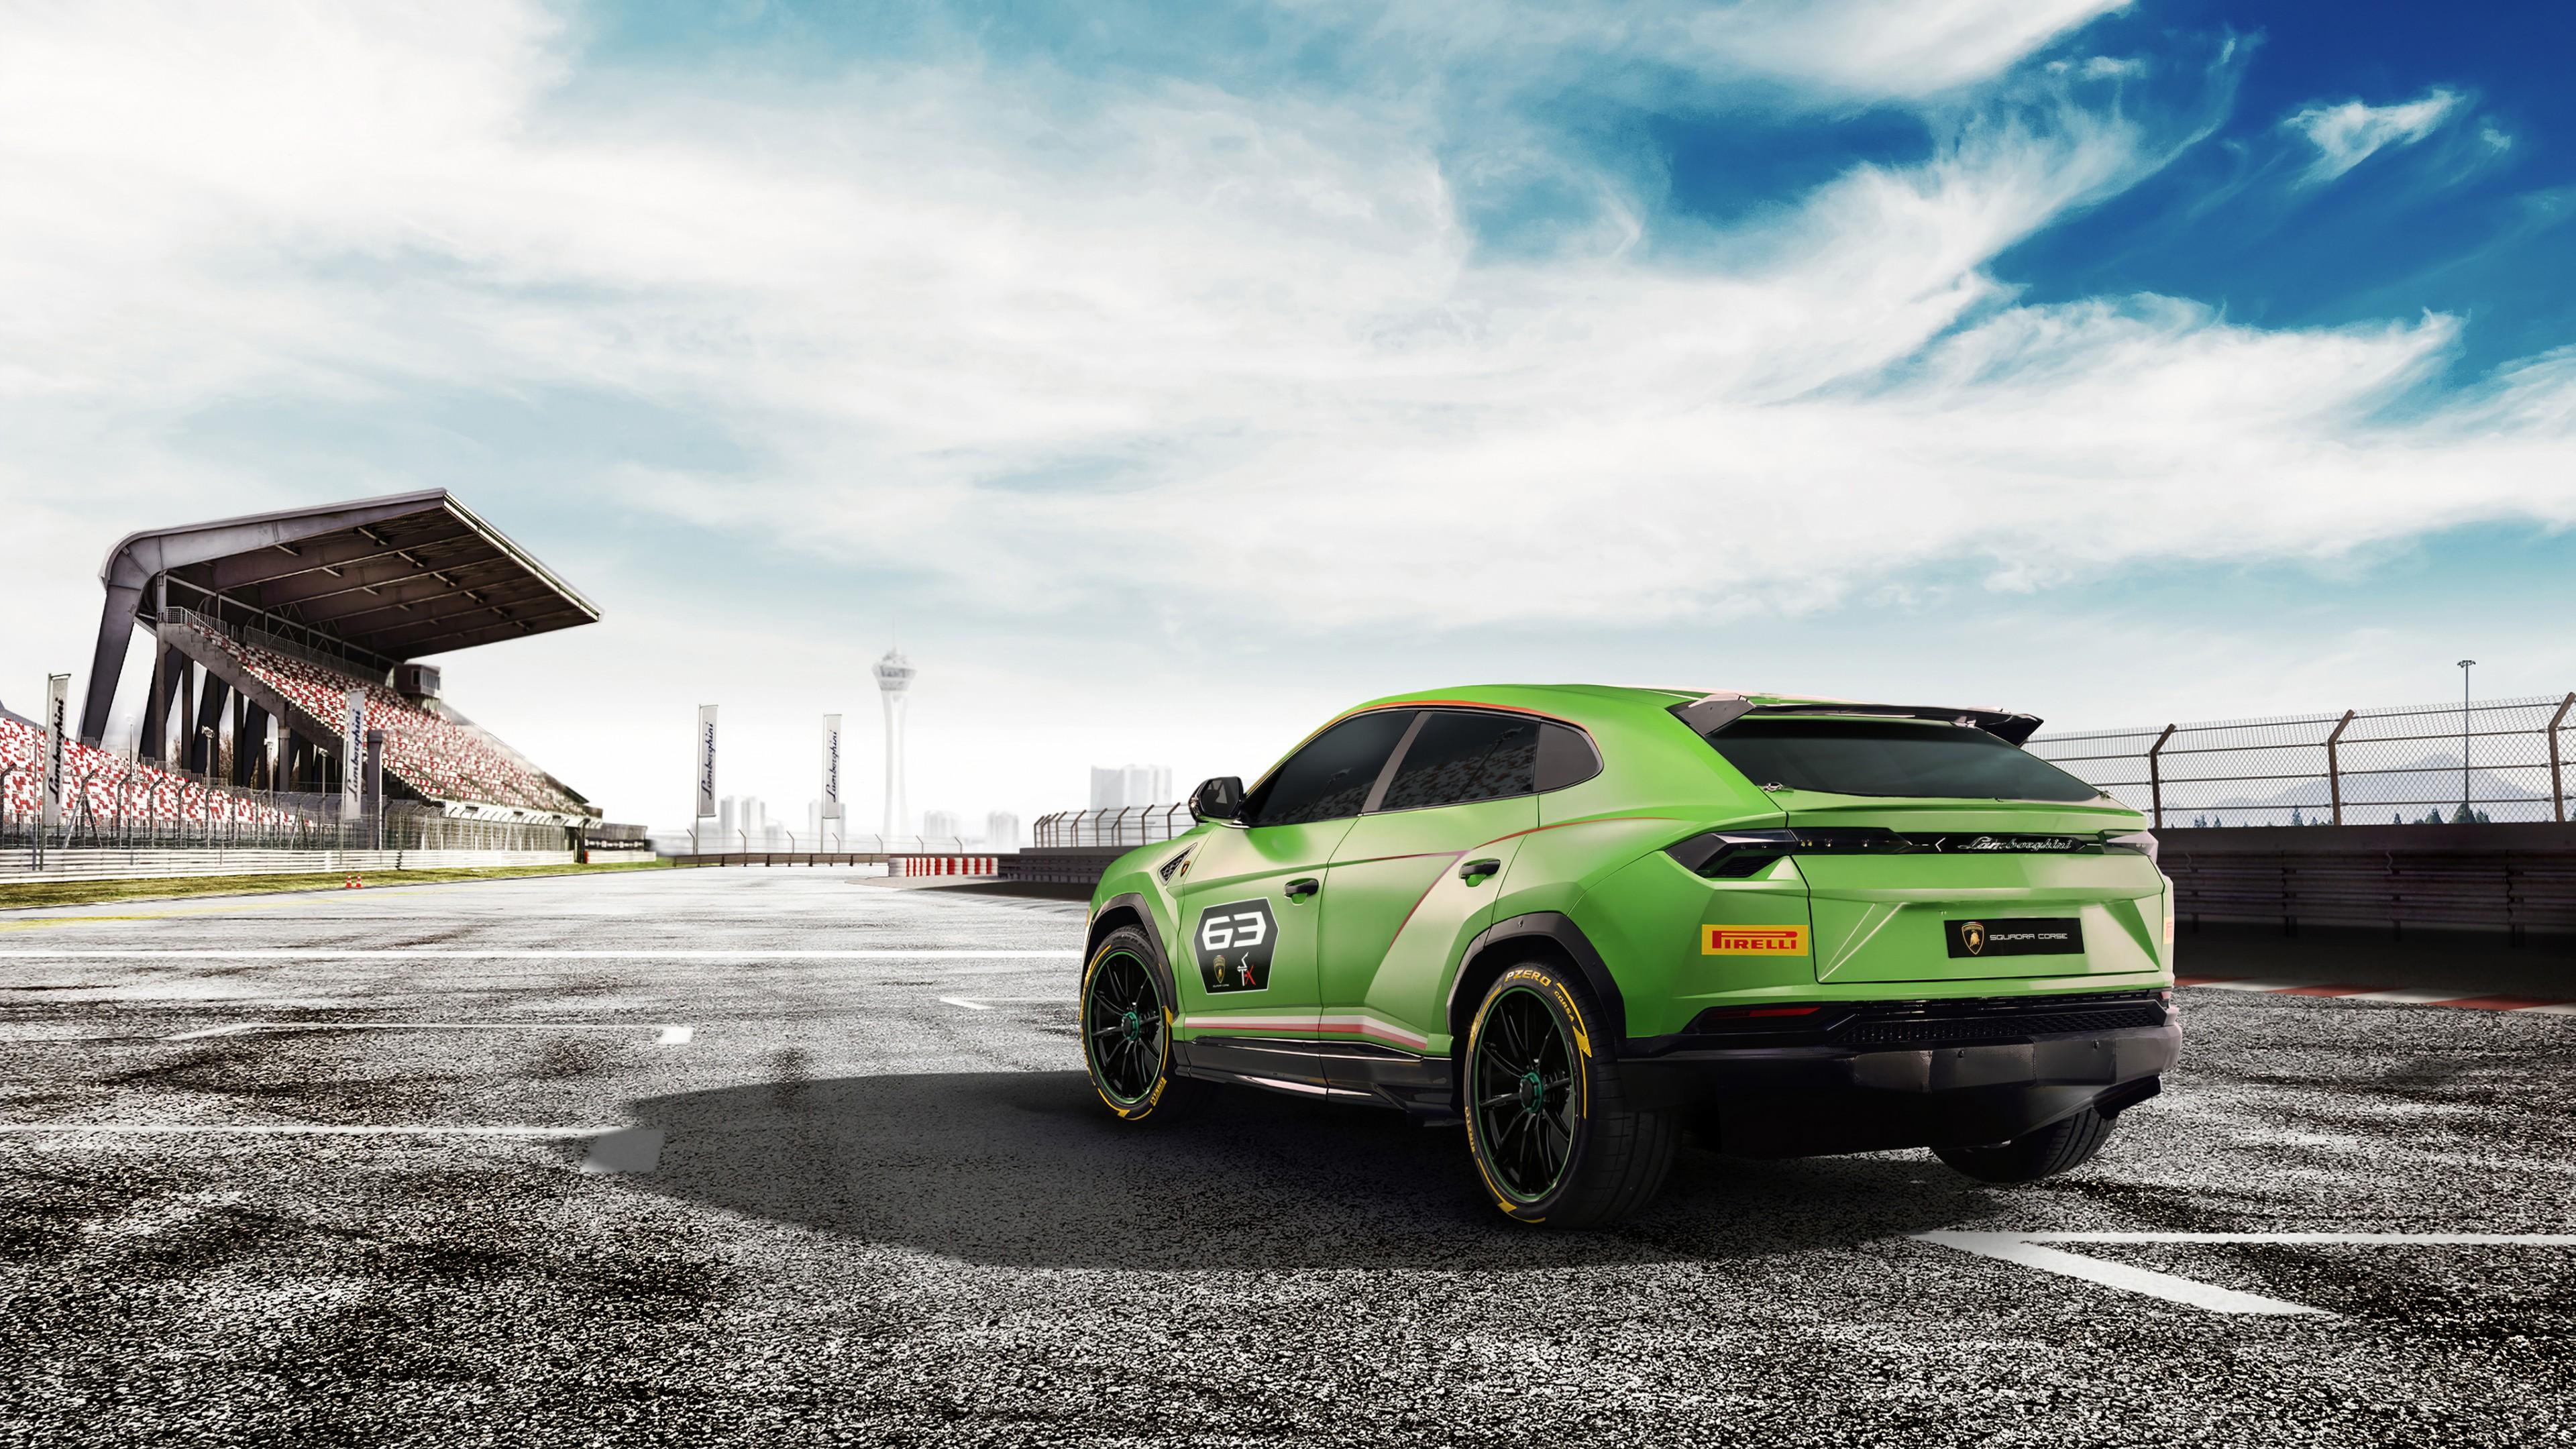 Wallpaper Lamborghini Urus St X Suv Supercar 4k Cars Bikes